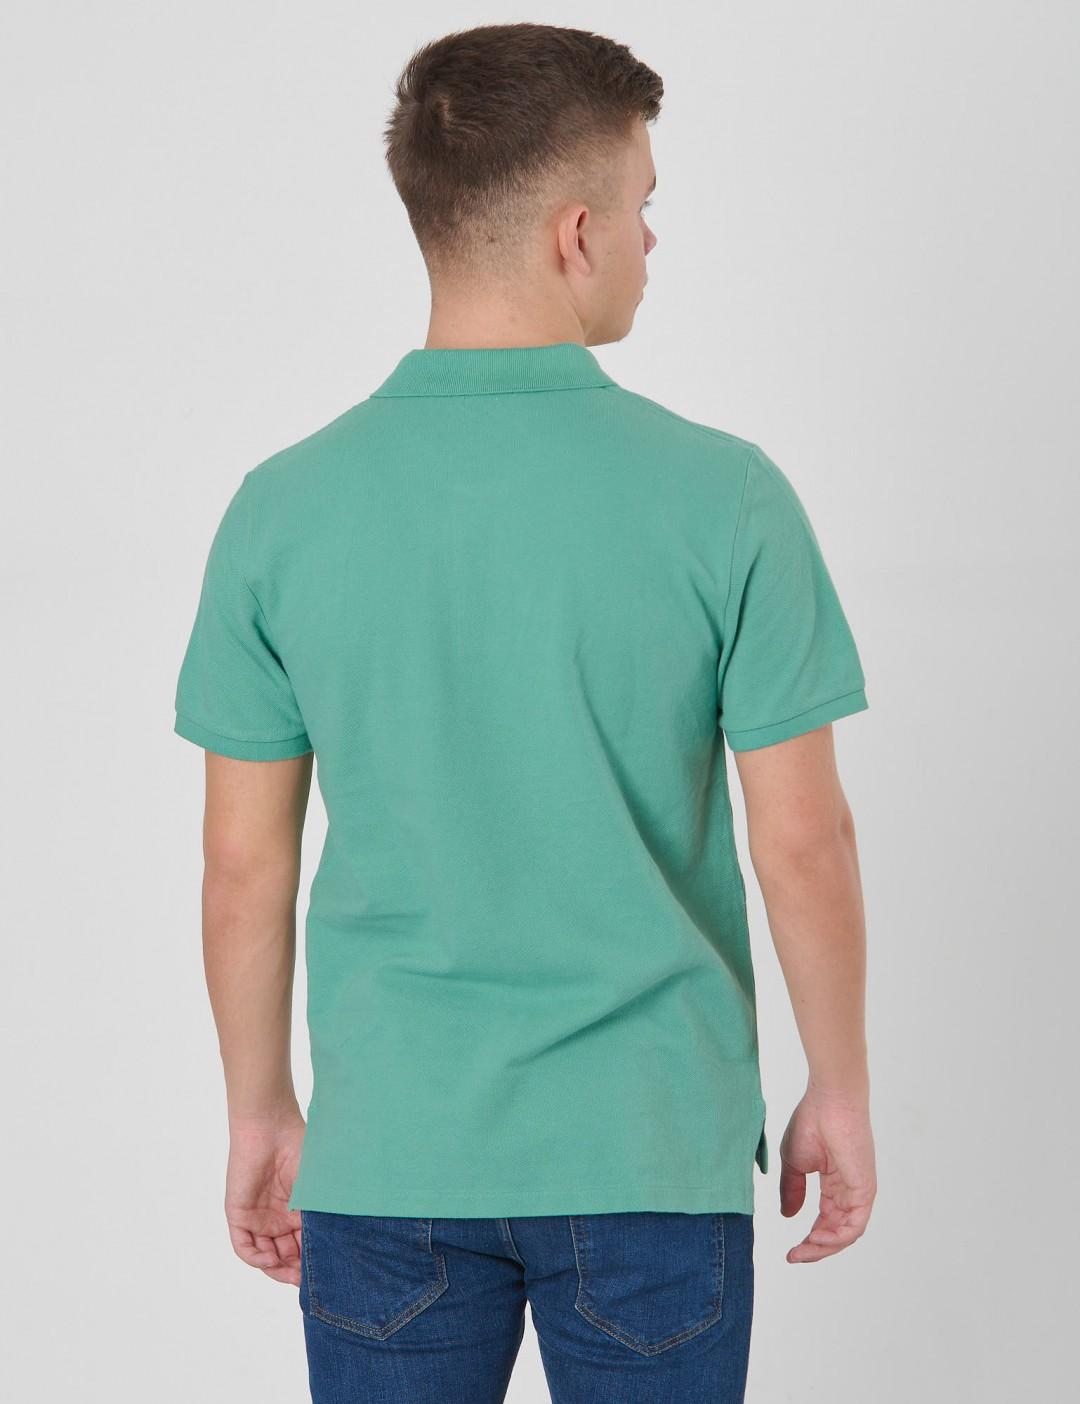 da7310c9ddb Om Slim Polo - Grön från Ralph Lauren | KidsBrandStore